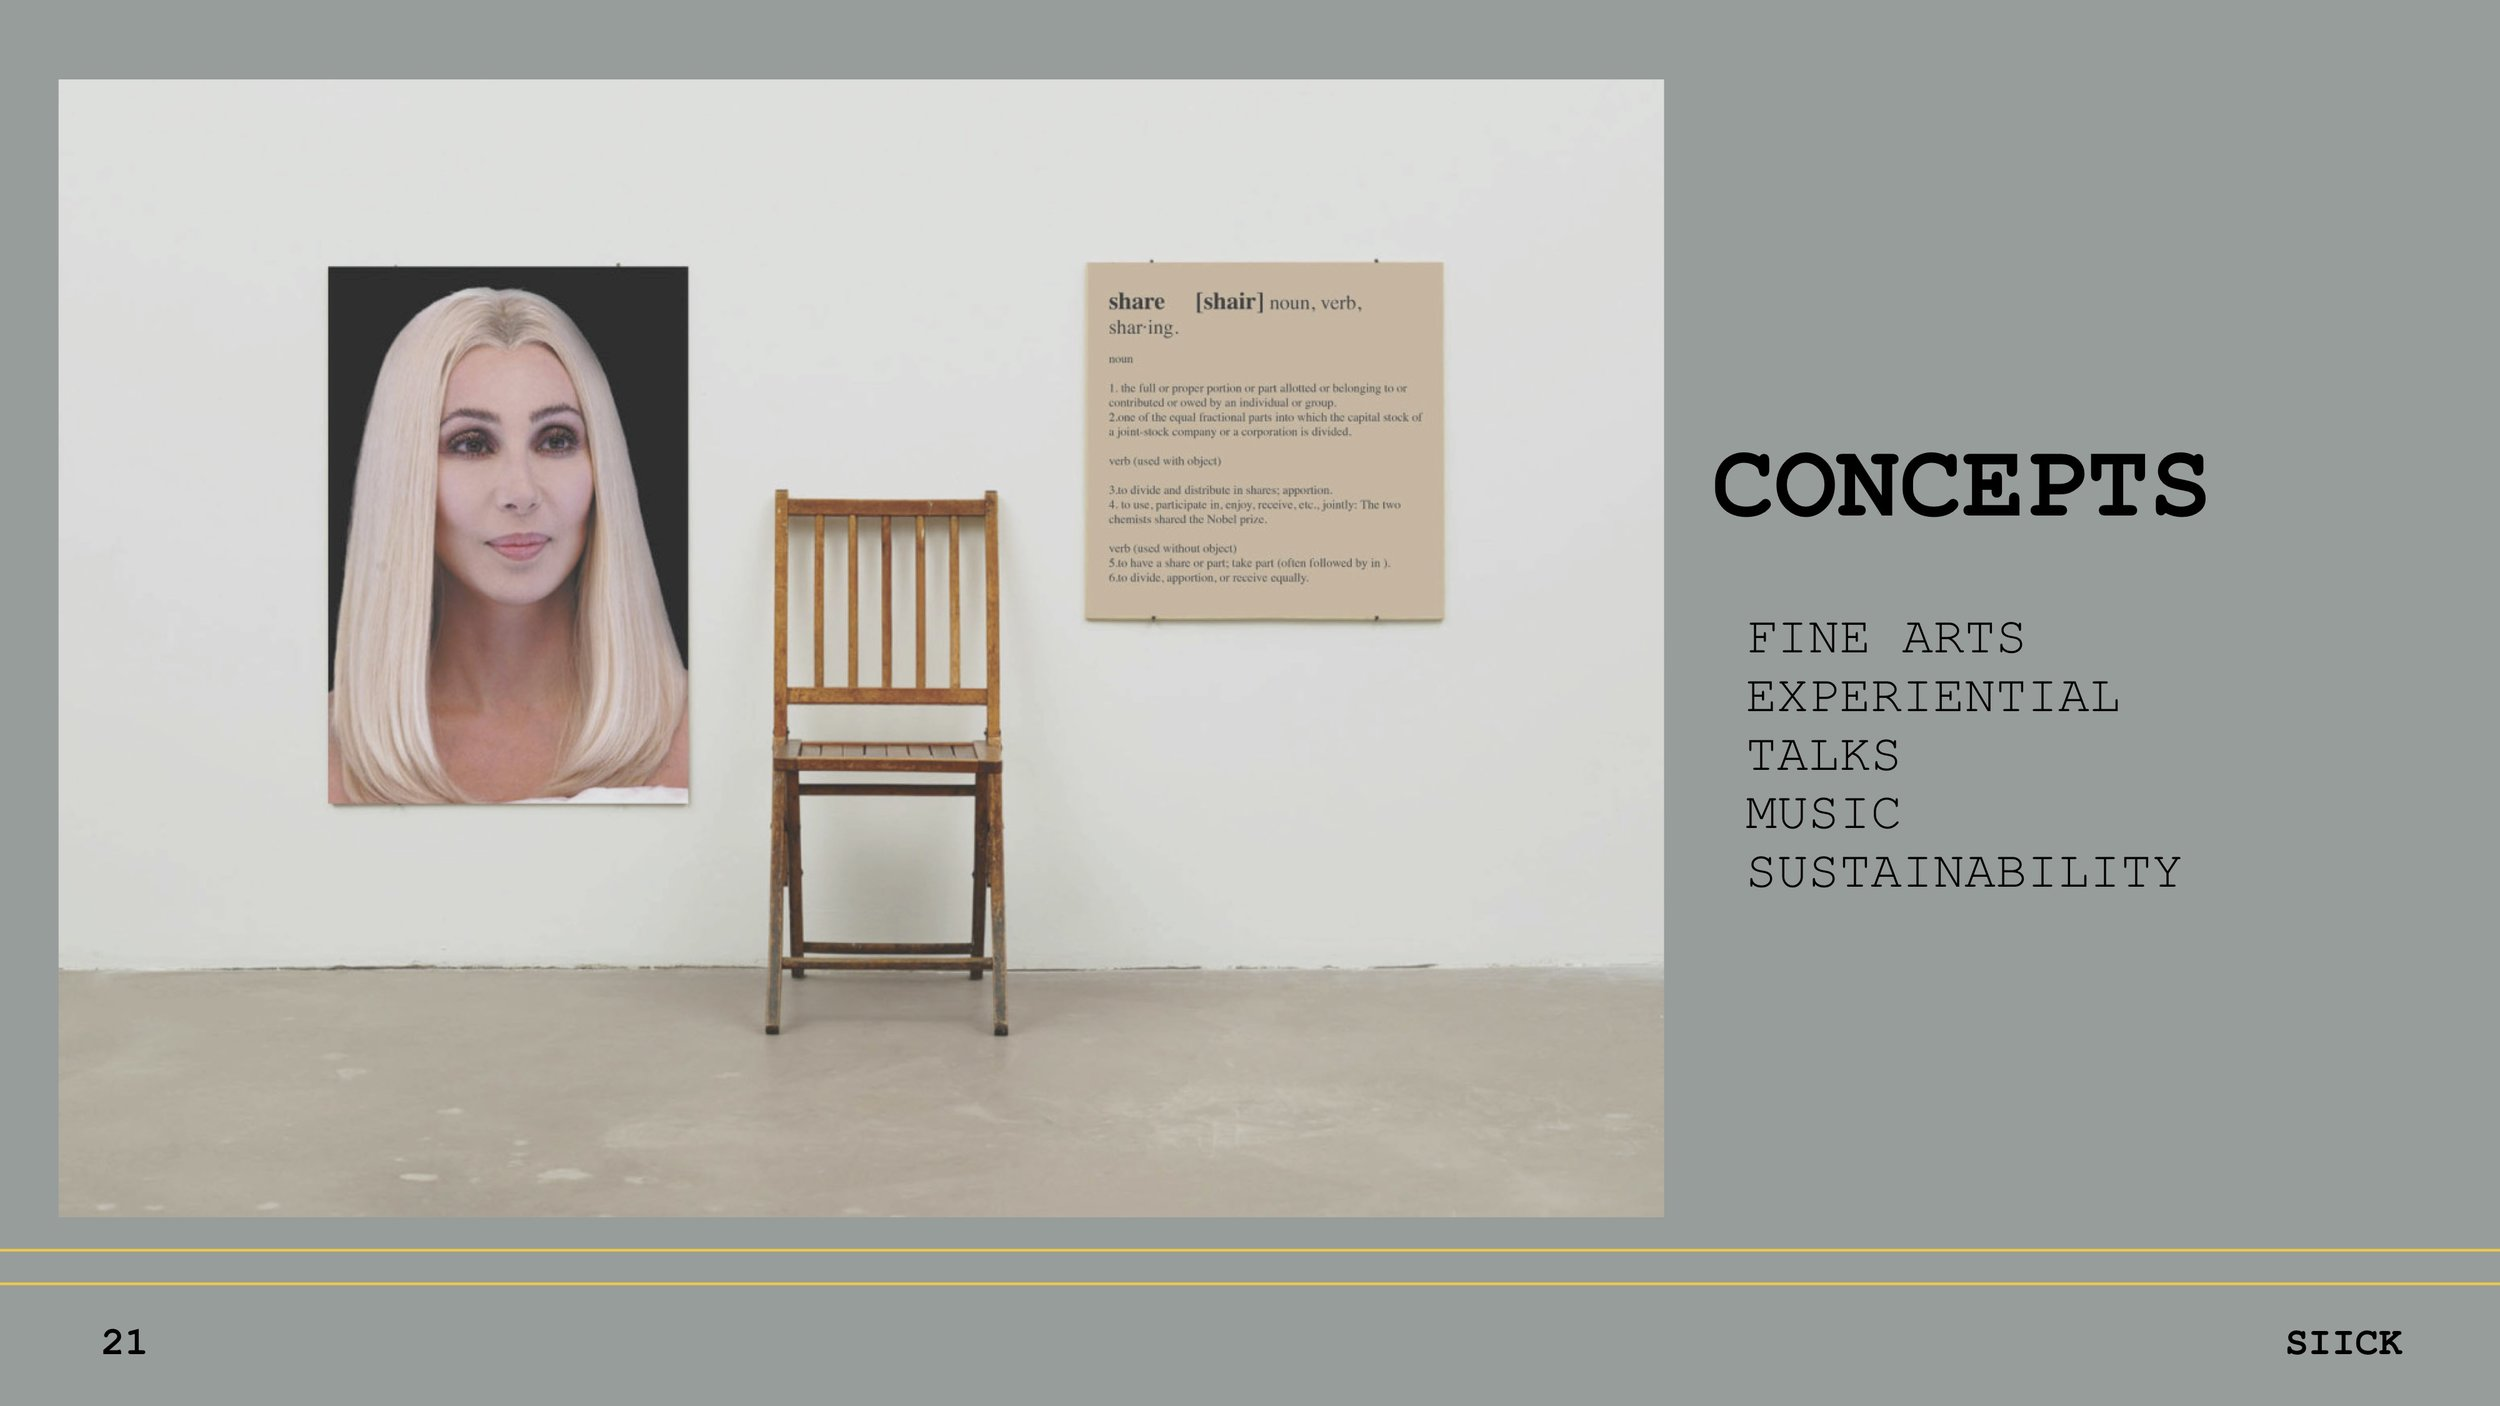 Complex-JHU-CConcept22.jpg